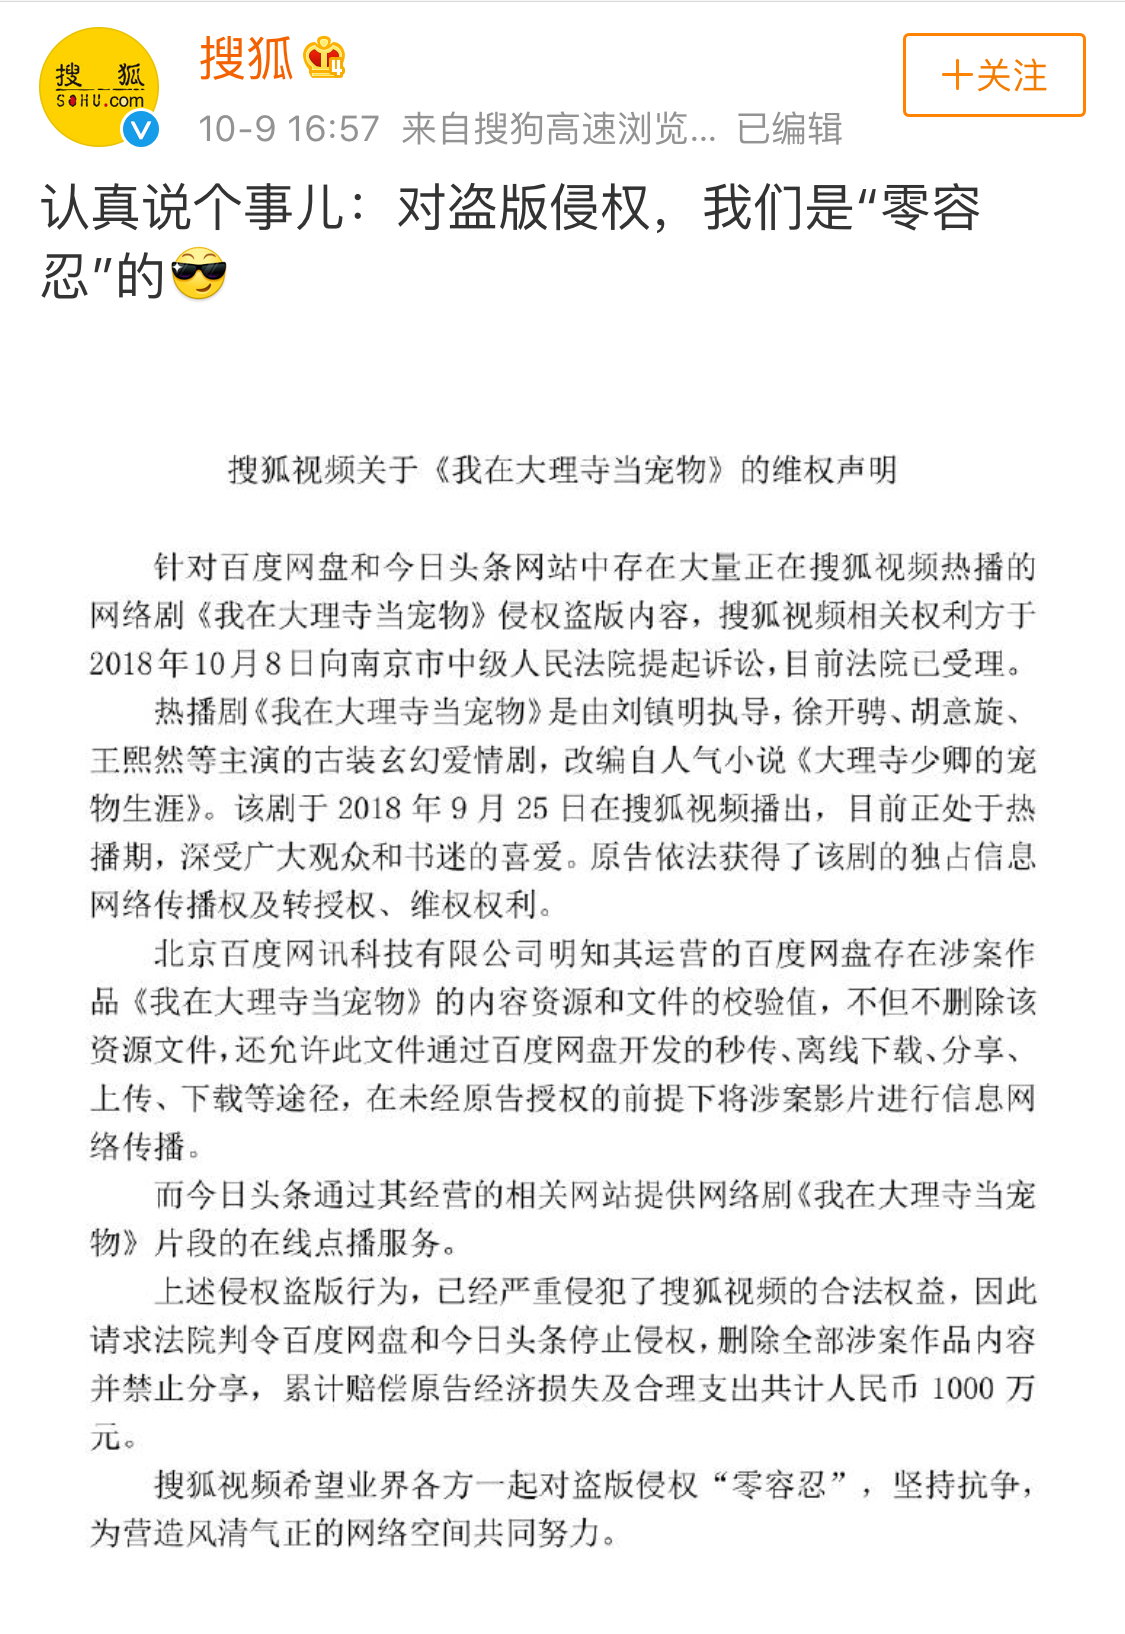 搜狐版权被盗起诉百度、今日<font color=